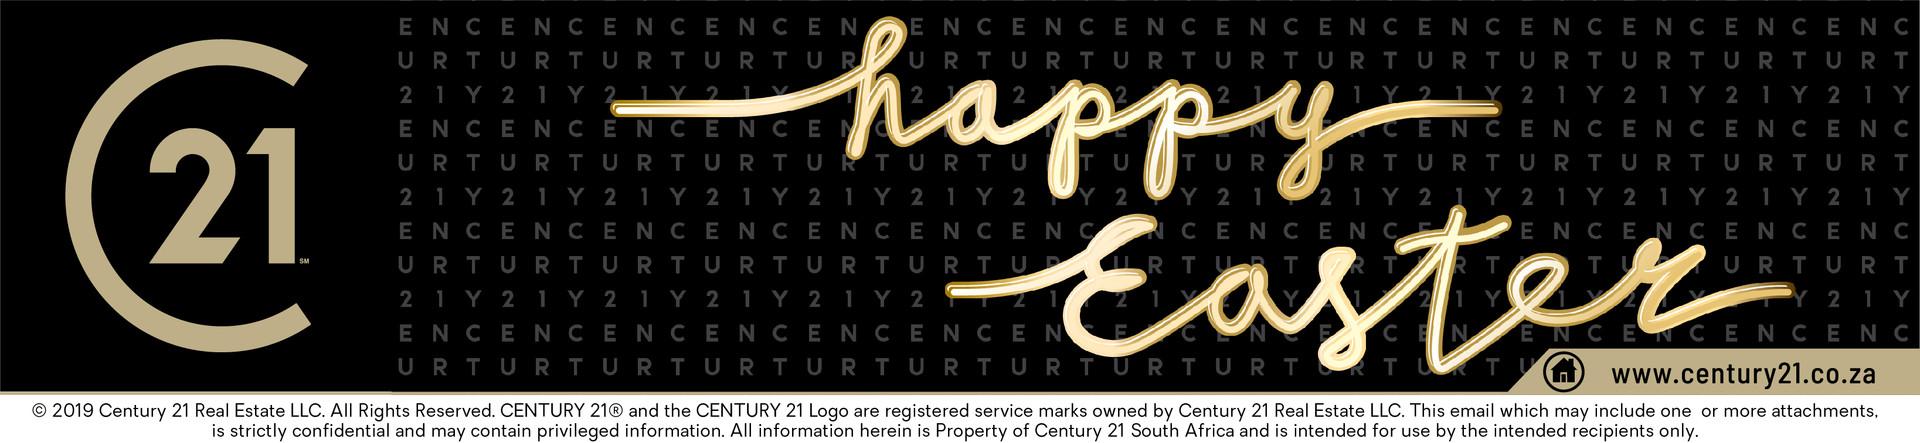 Easter_Signature-03.jpg